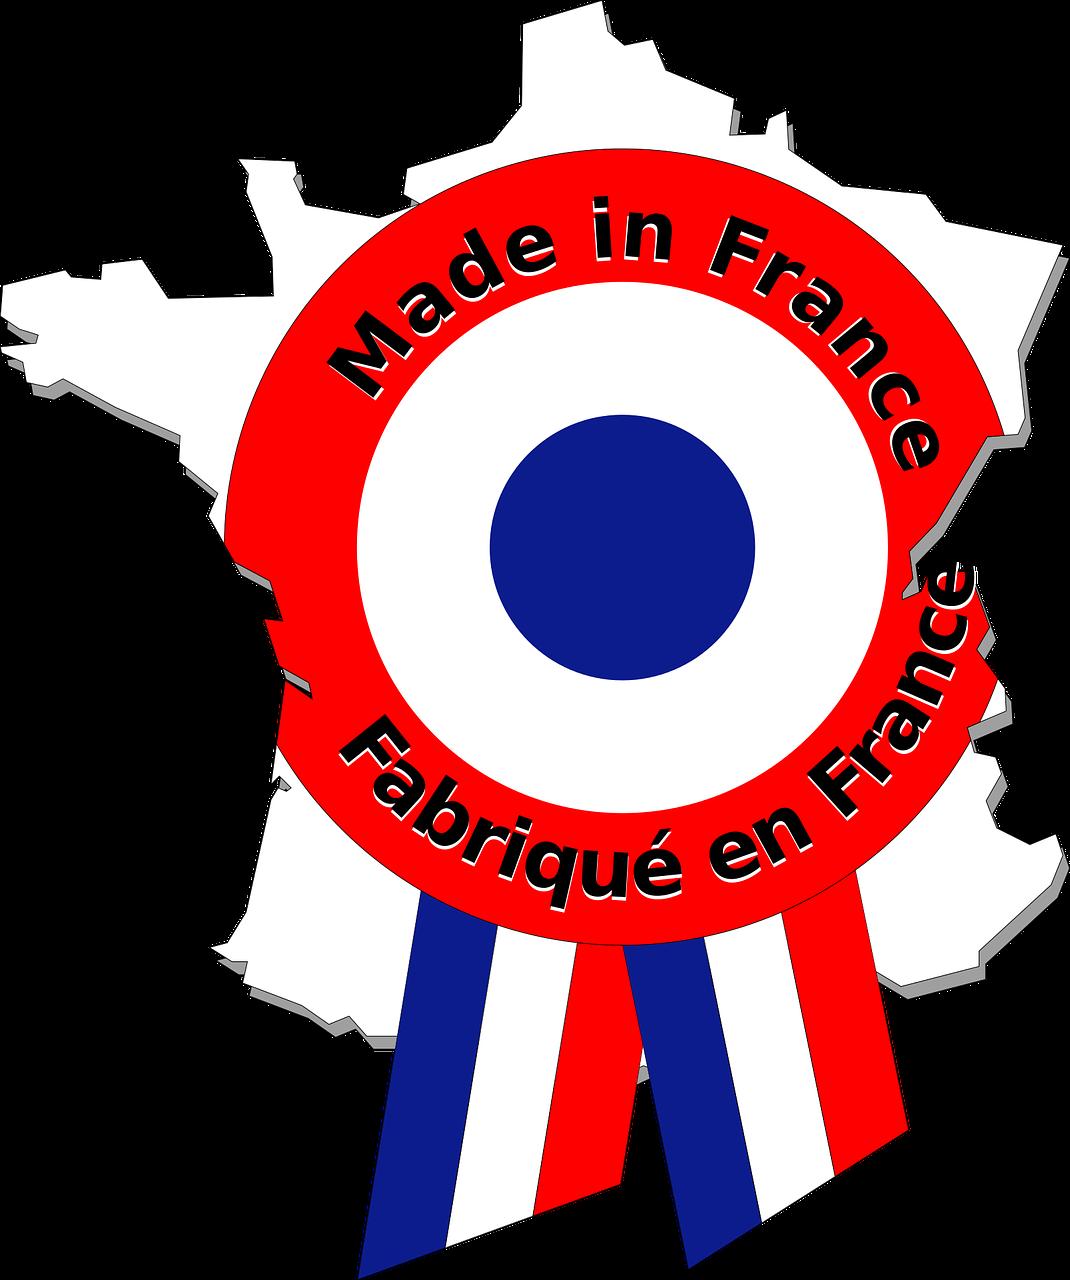 Internationalisation made in france